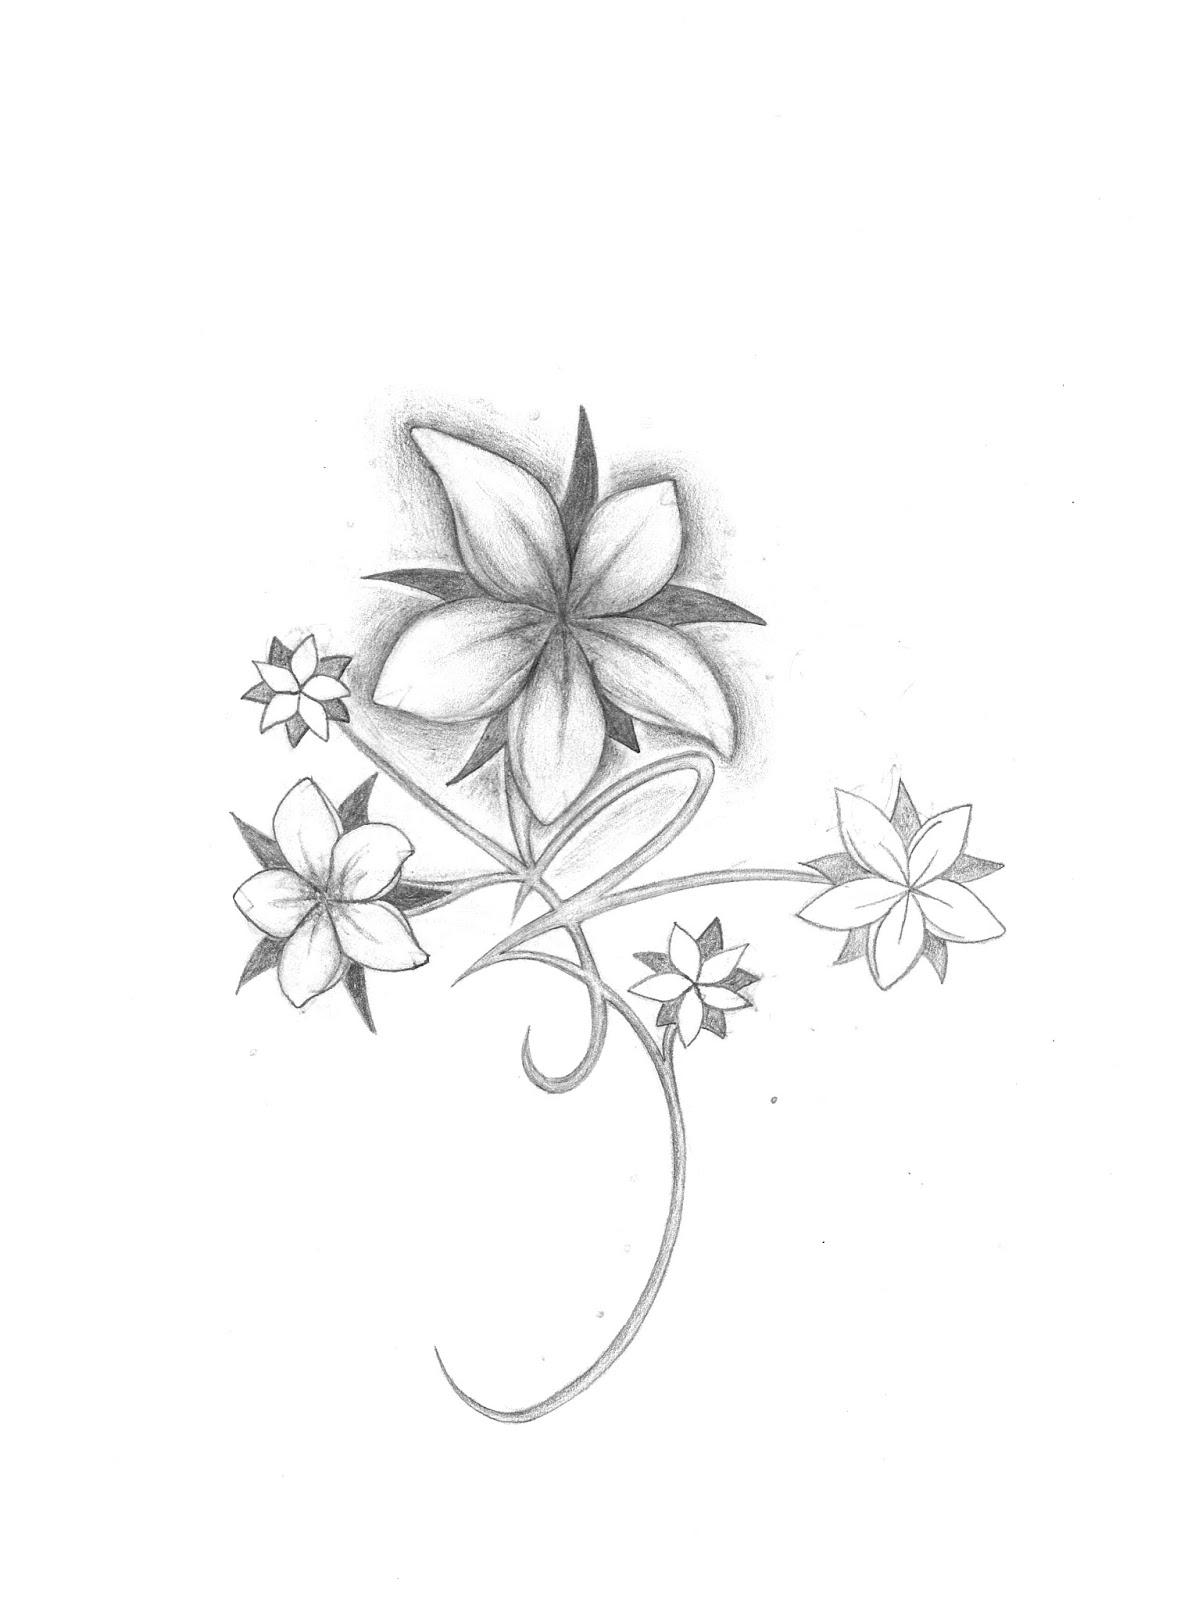 Nathalie Kennedy PortfolioMonth Of May Flower Tattoos